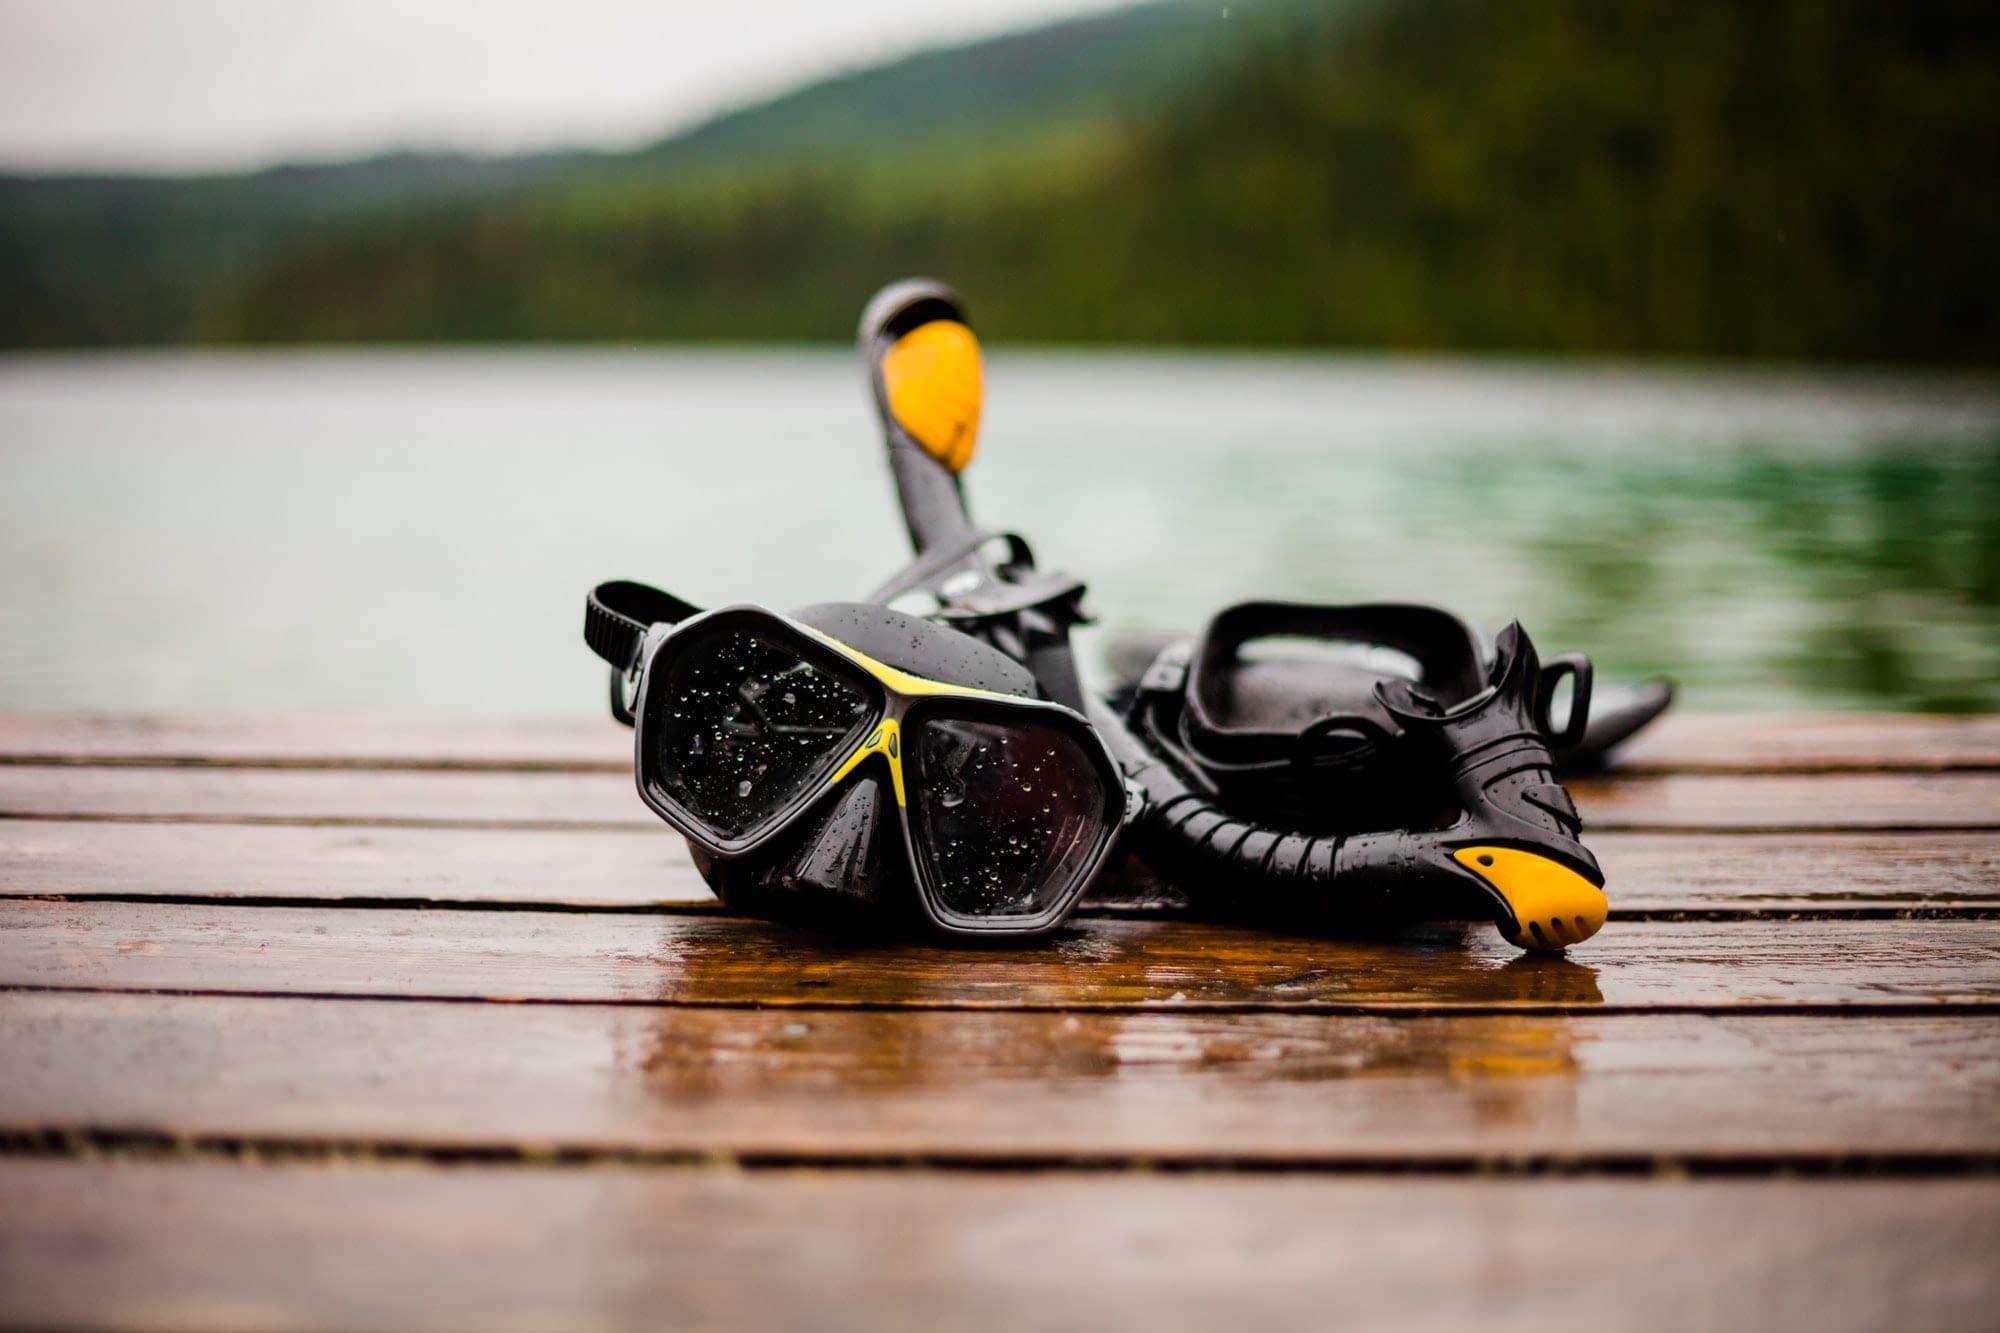 Snorkeling Mask and Tuba on Dock